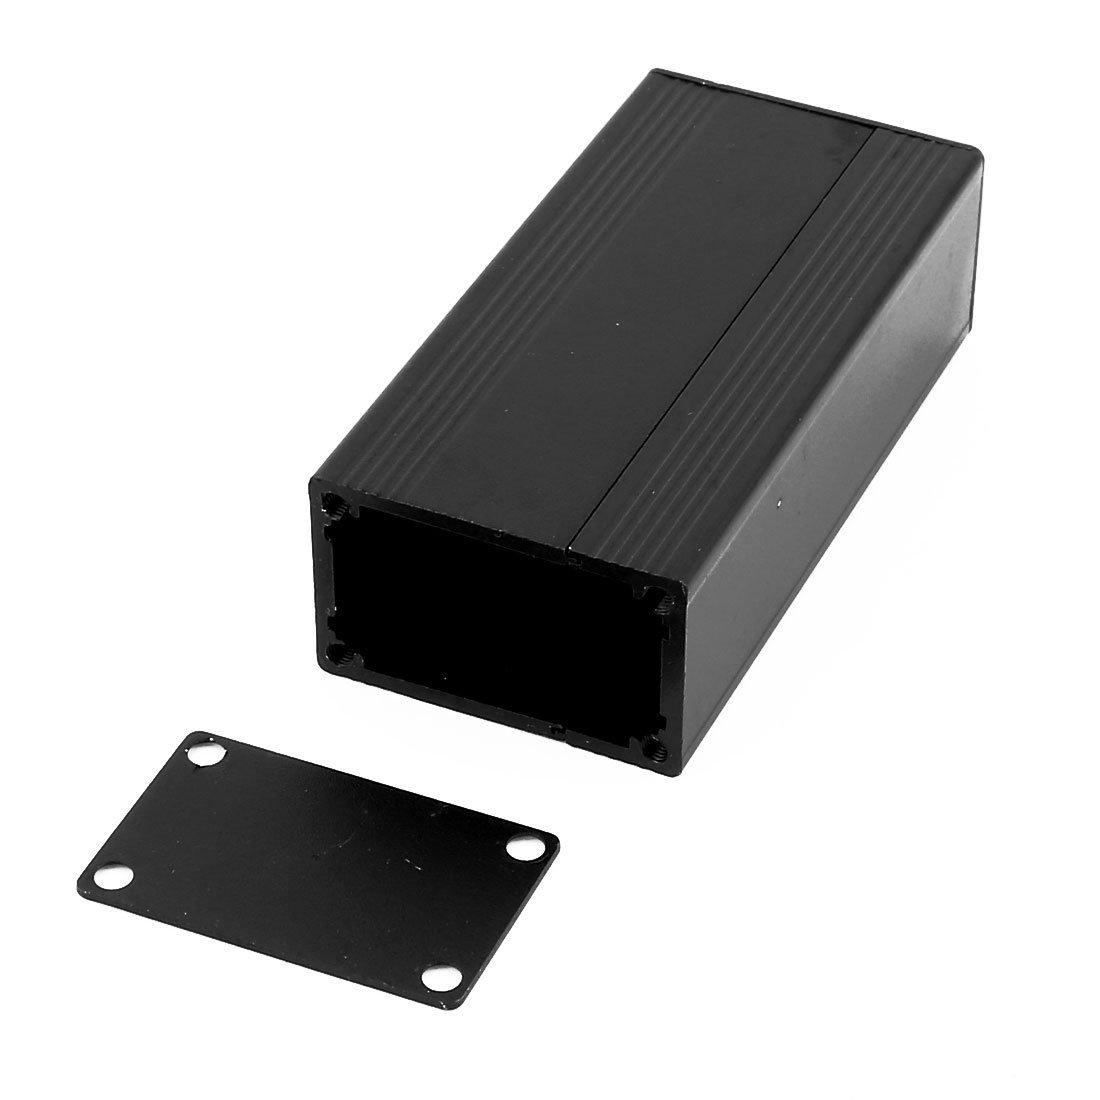 Amazon.com: eDealMax 83 x 40 x 25 mm Polivalente electrónica de aluminio extruido del caso del recinto Negro: Electronics